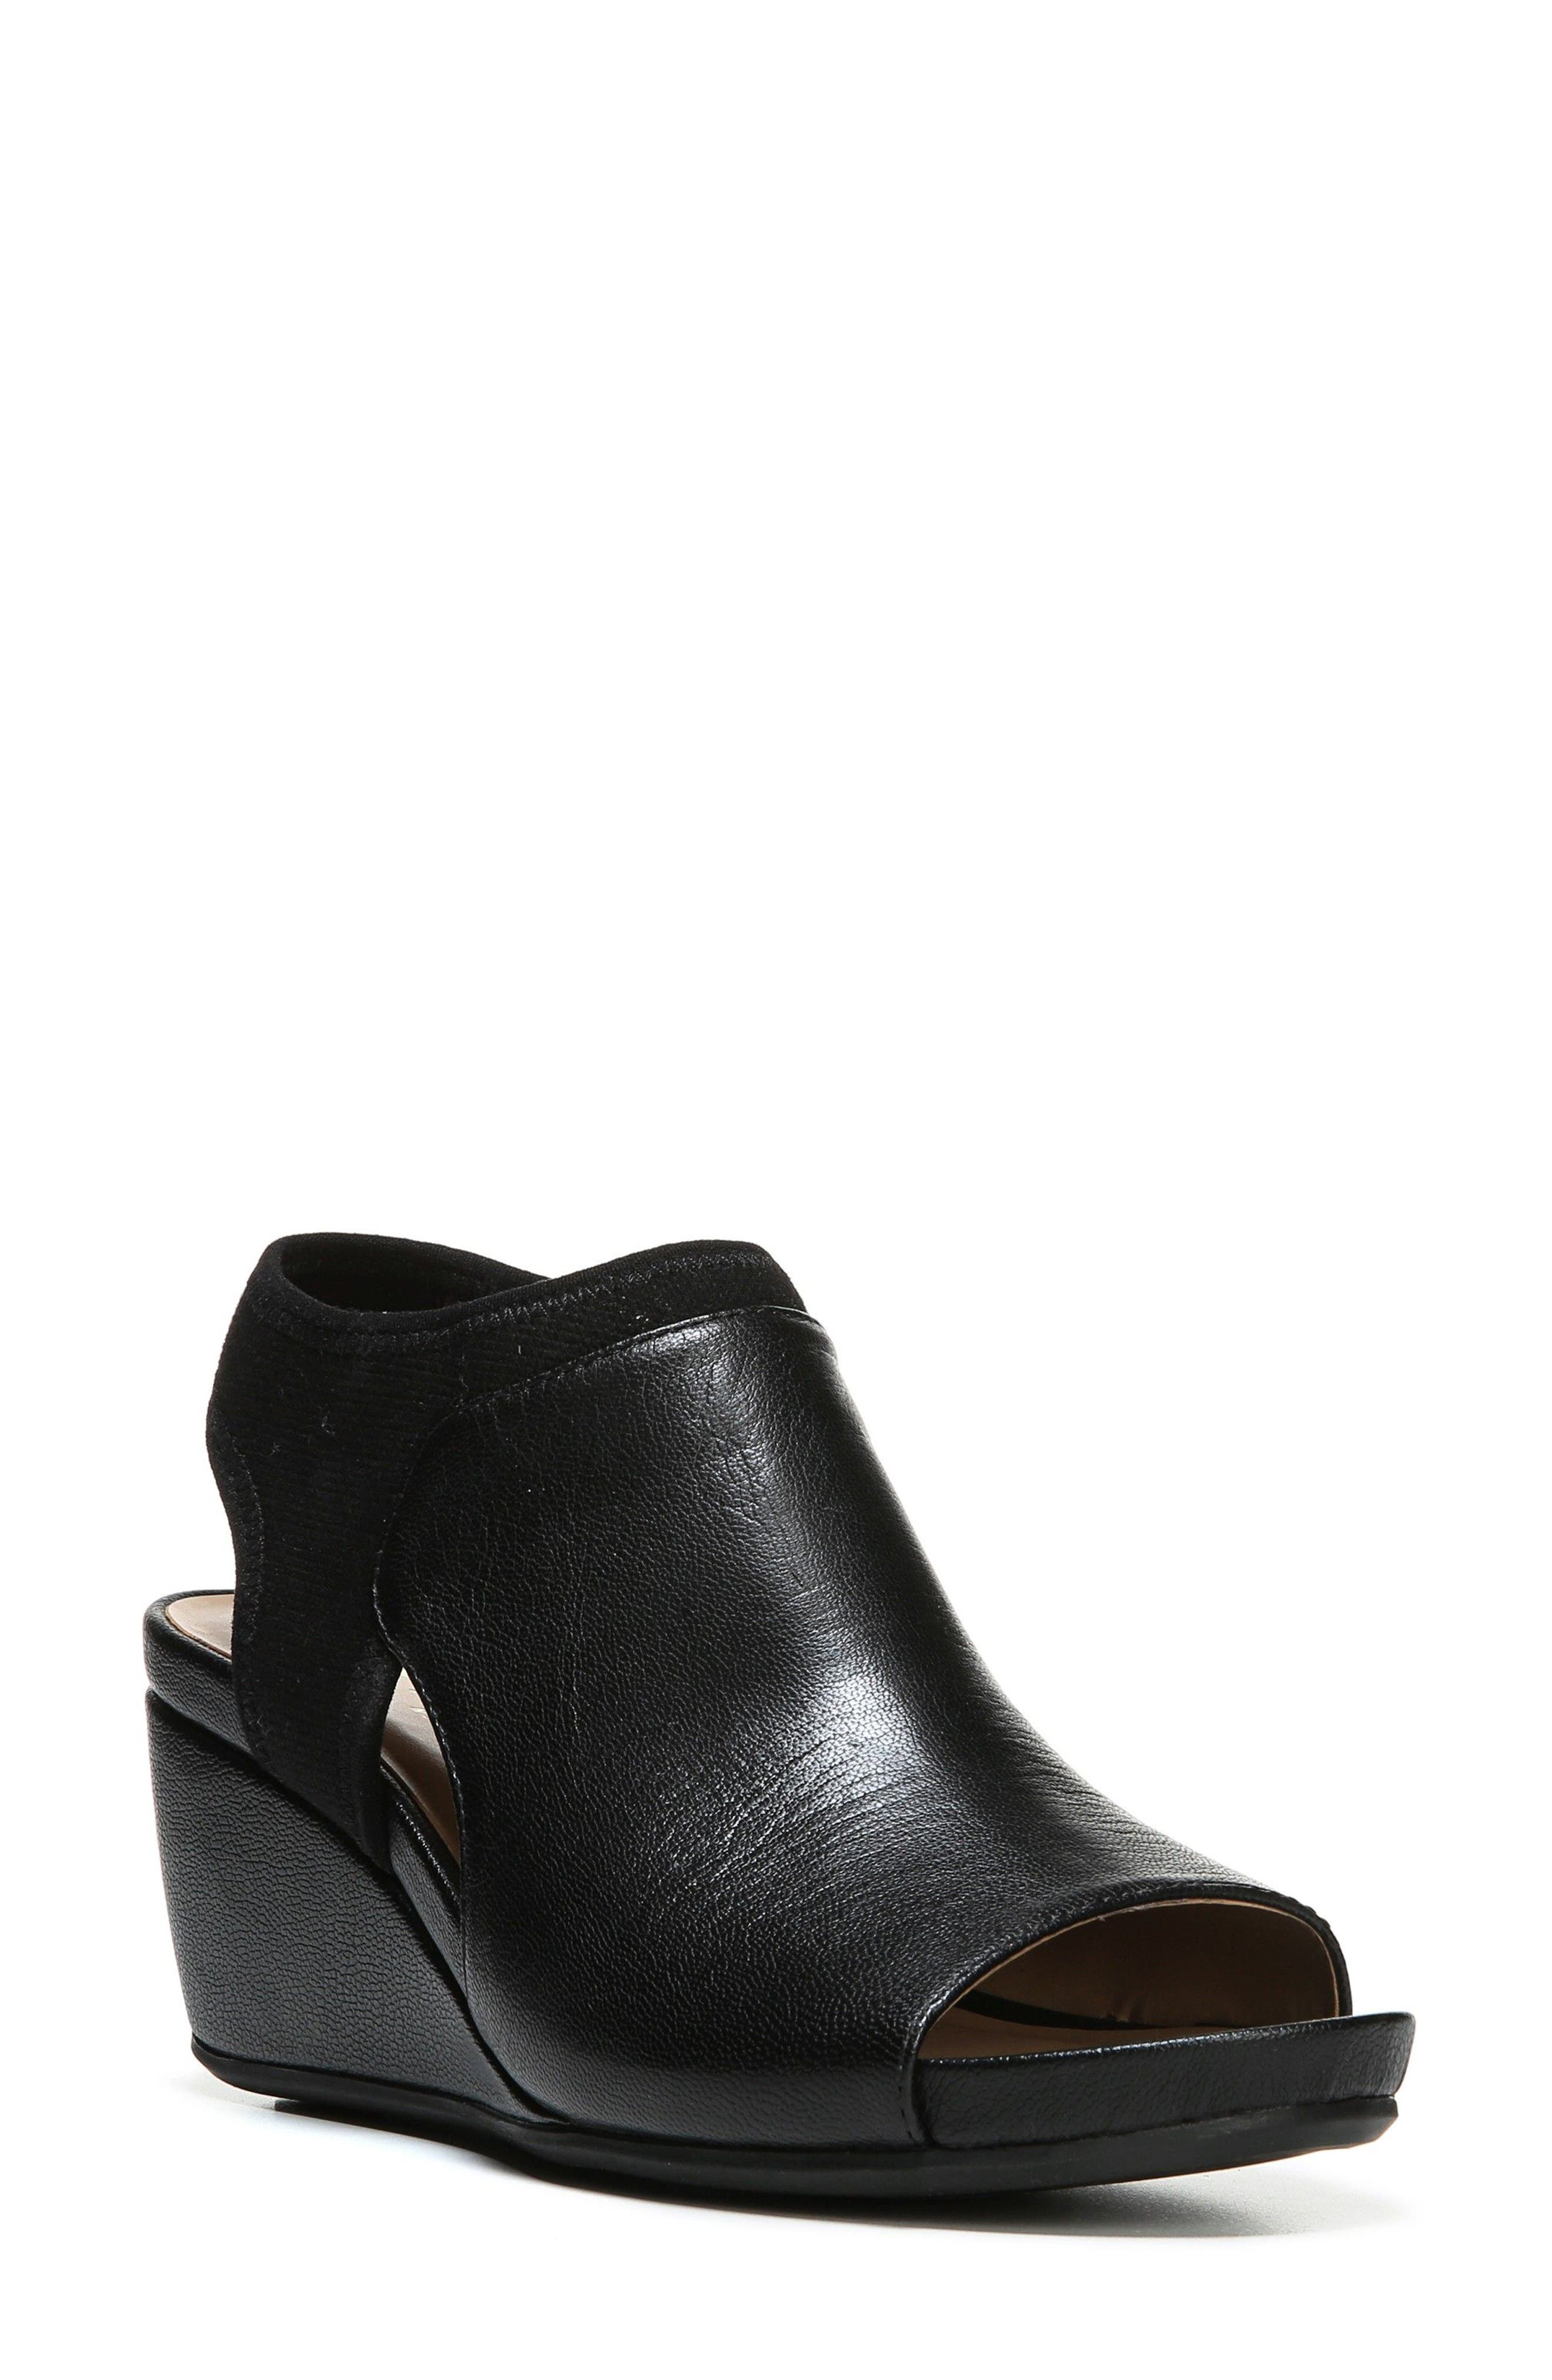 Cailla Shield Sandal,                         Main,                         color, 001